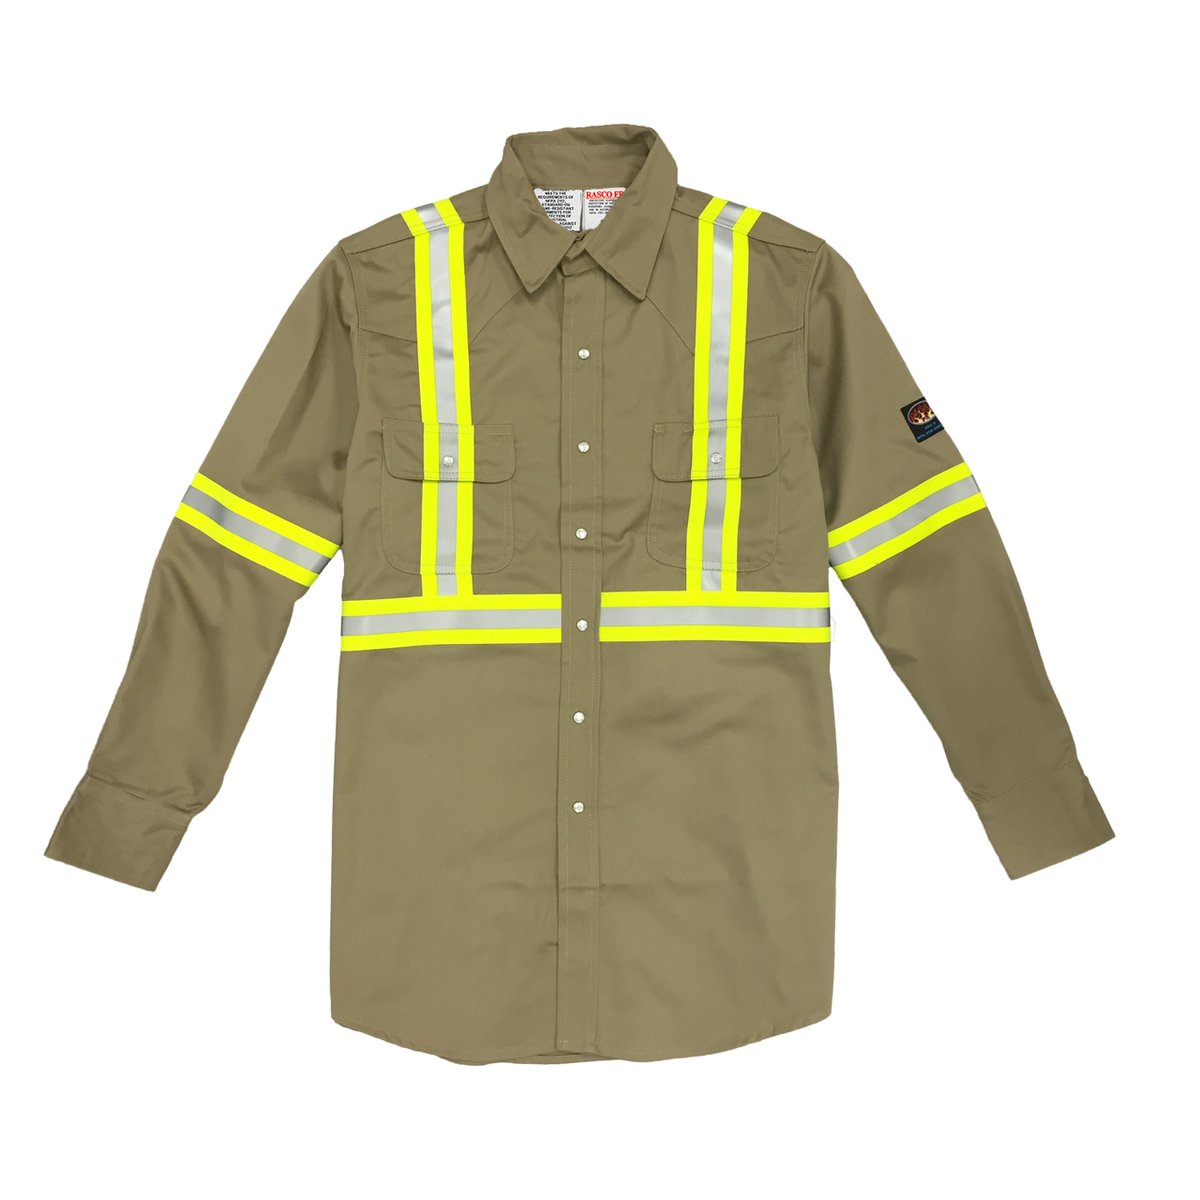 790103cb84fc0 Rasco FR Khaki Reflective Work Shirt For Sale | D.E. Gemmill